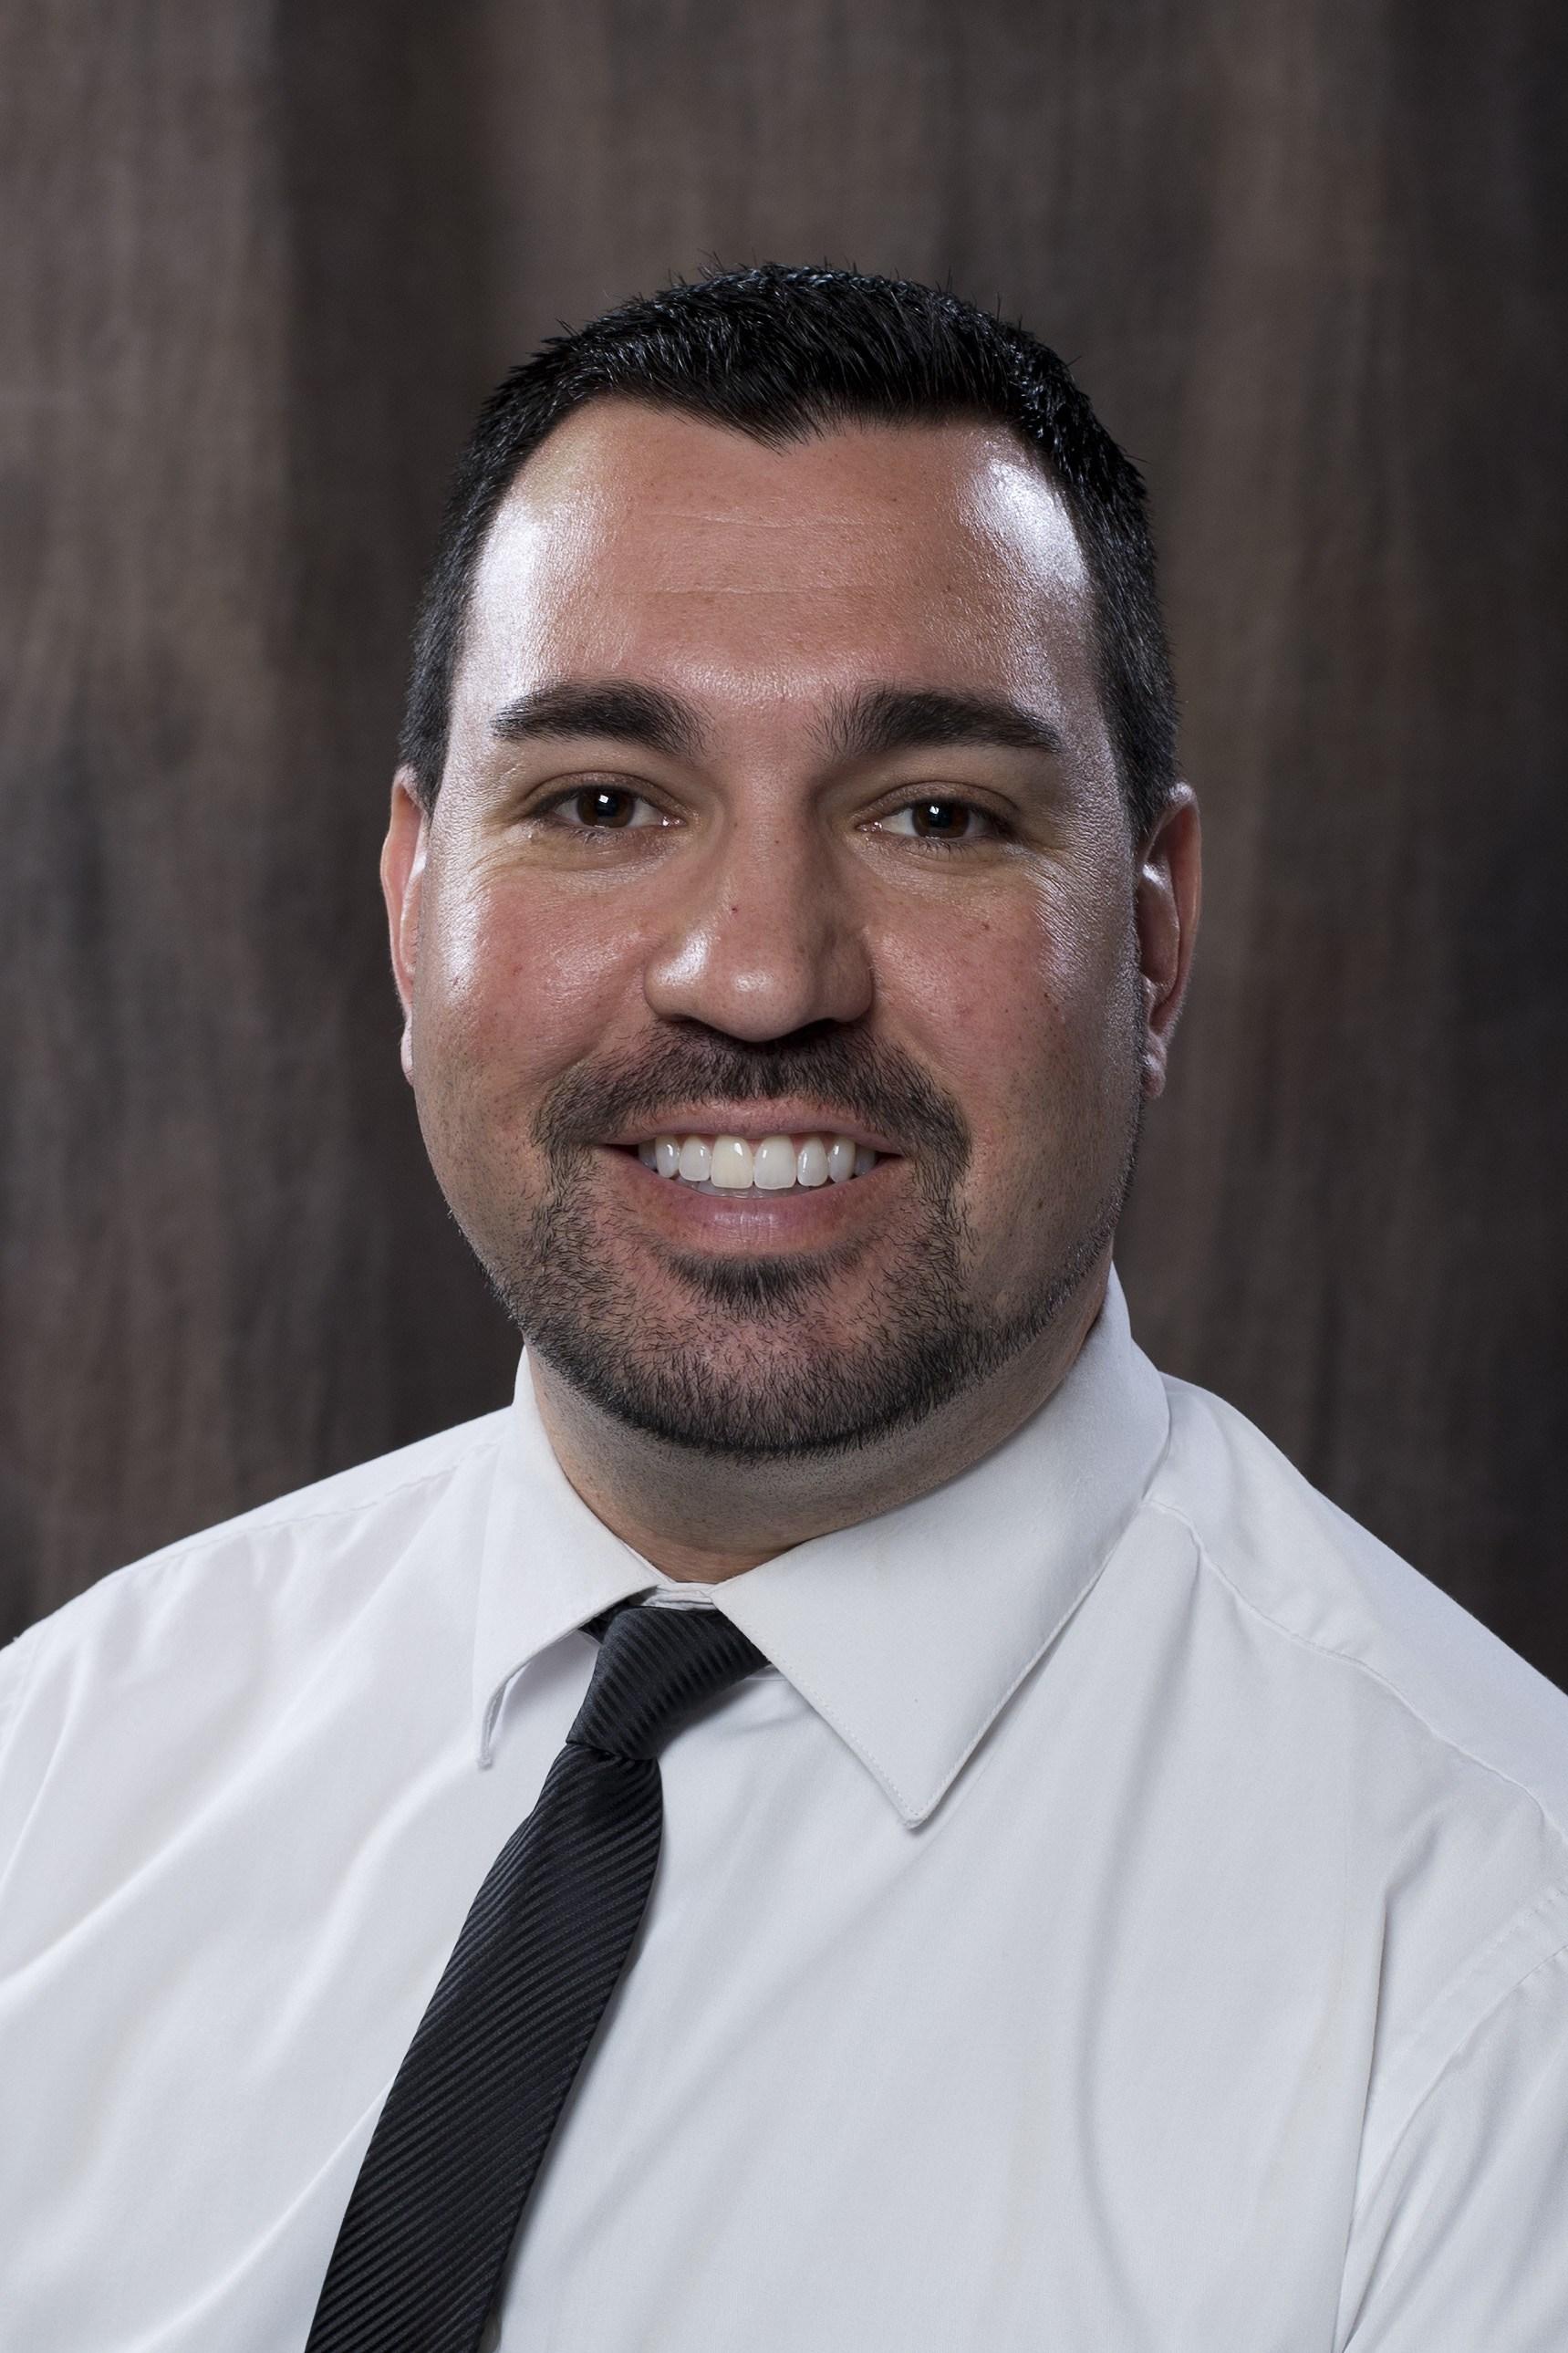 Cisco Diaz, Principal of W.G. Nunn